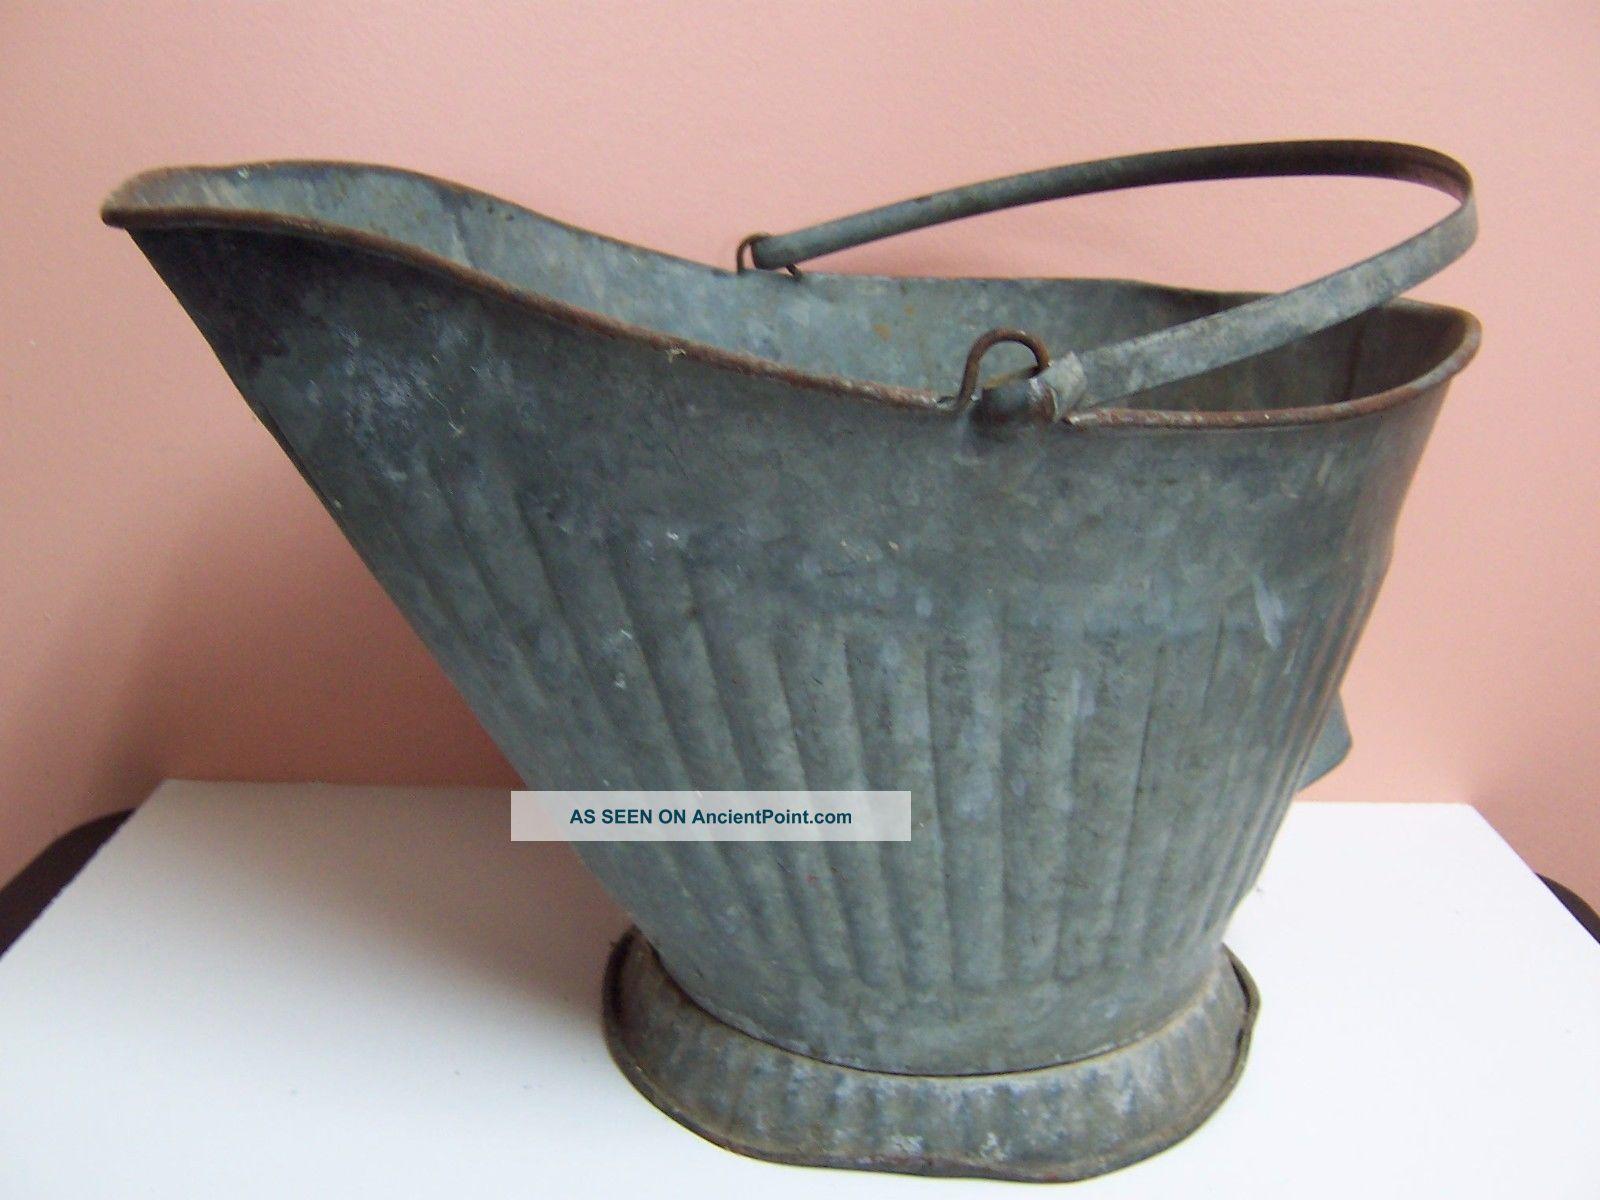 Vintage Antique Coal Scuttle Metal Ribbed Design 16